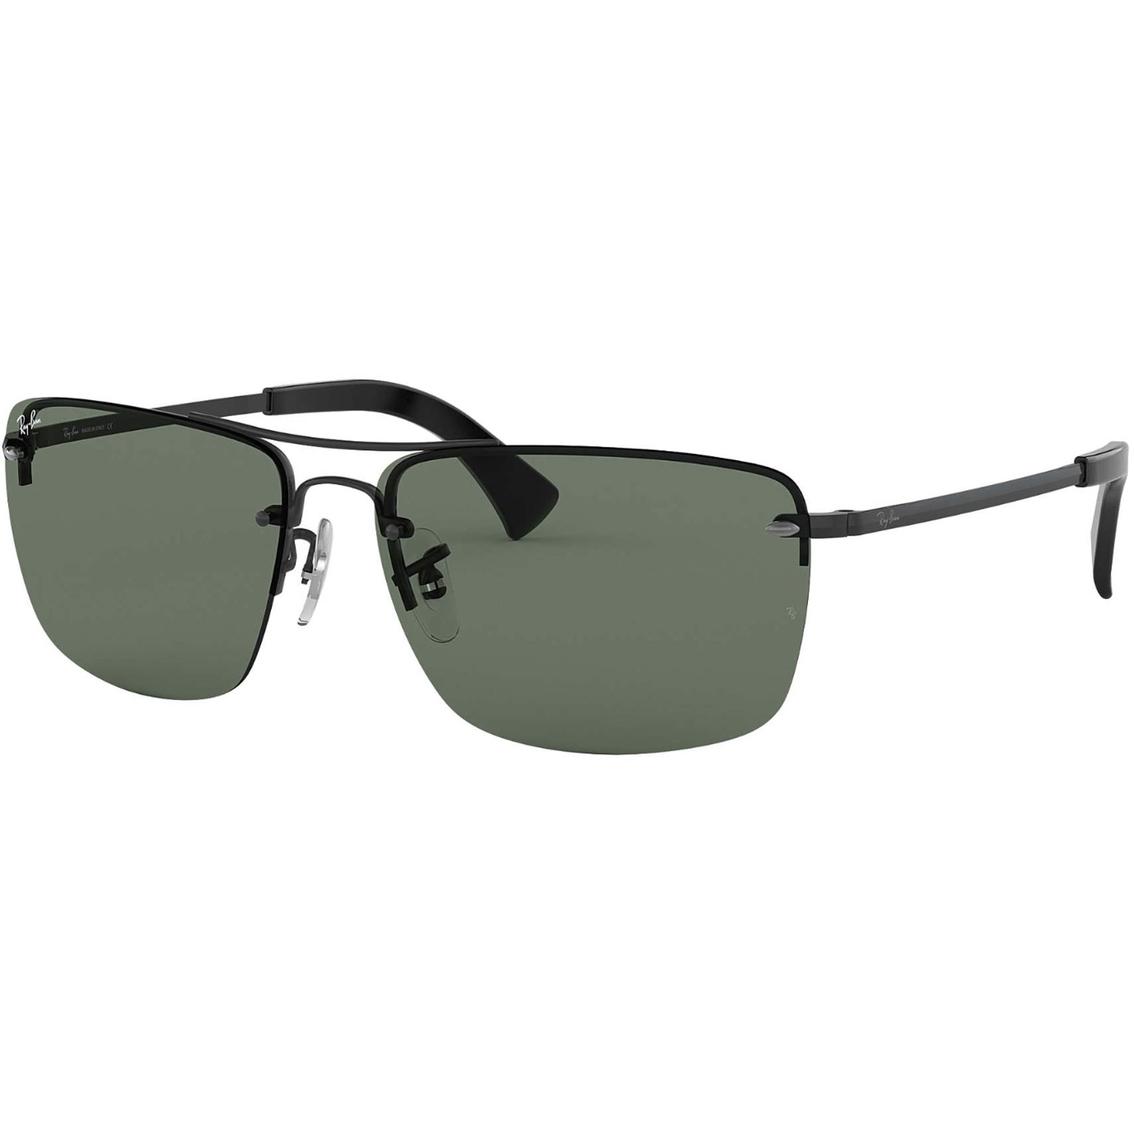 57ae1aa0d Ray Ban Rectangle Sunglasses 0rb360700271 | Men's Sunglasses ...